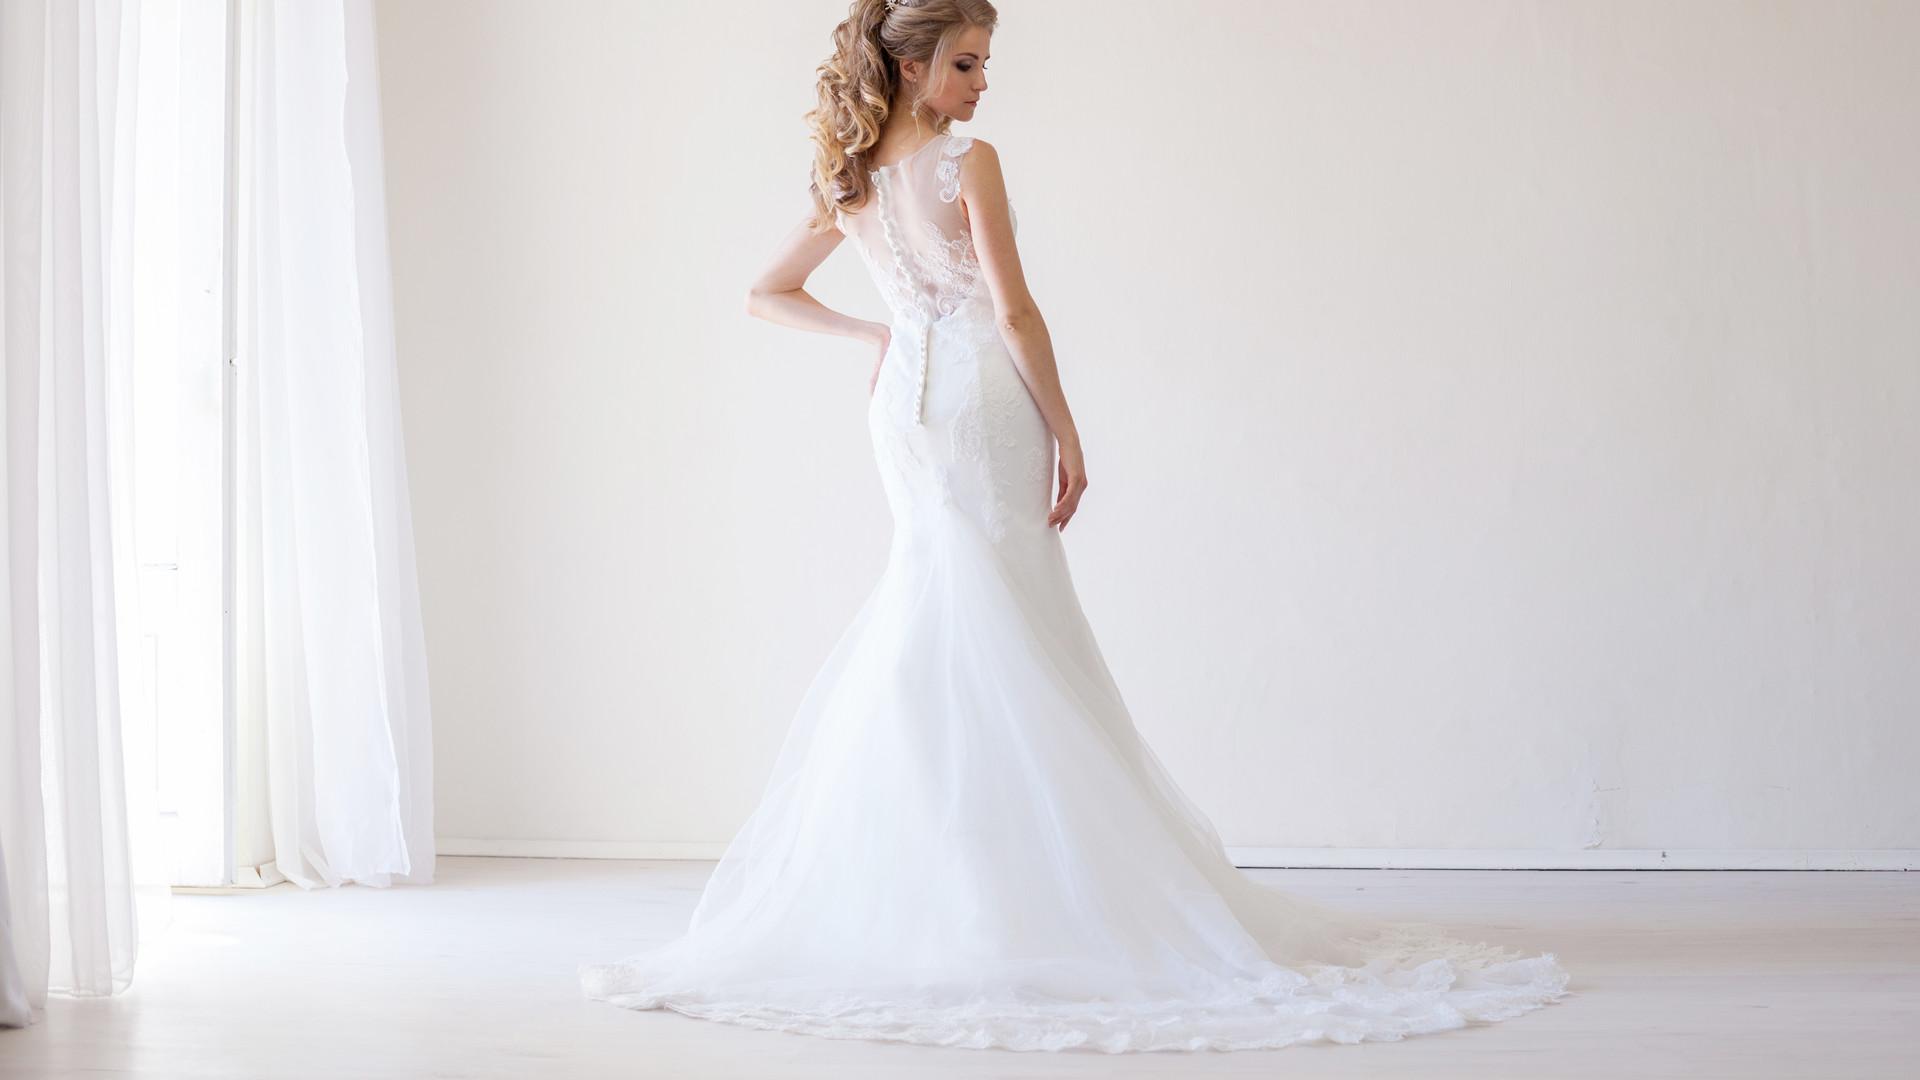 Stunning Bride   Meadowbank Estate   Wedding Venue   Campbellfield